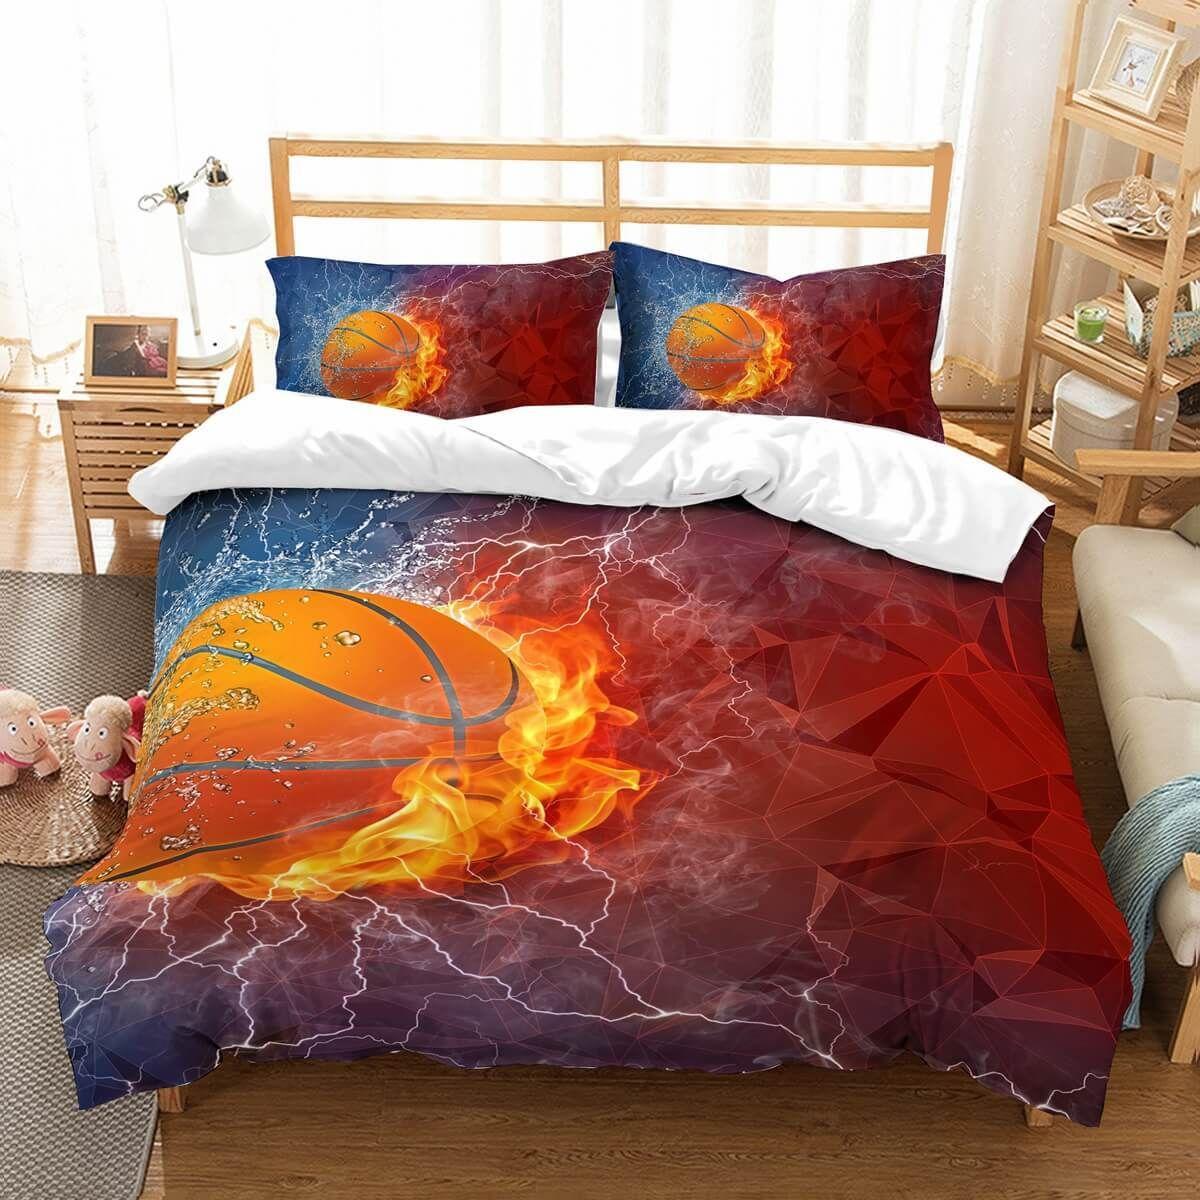 3d Customize The Basketball Bedding Set Duvet Cover Set Bedroom